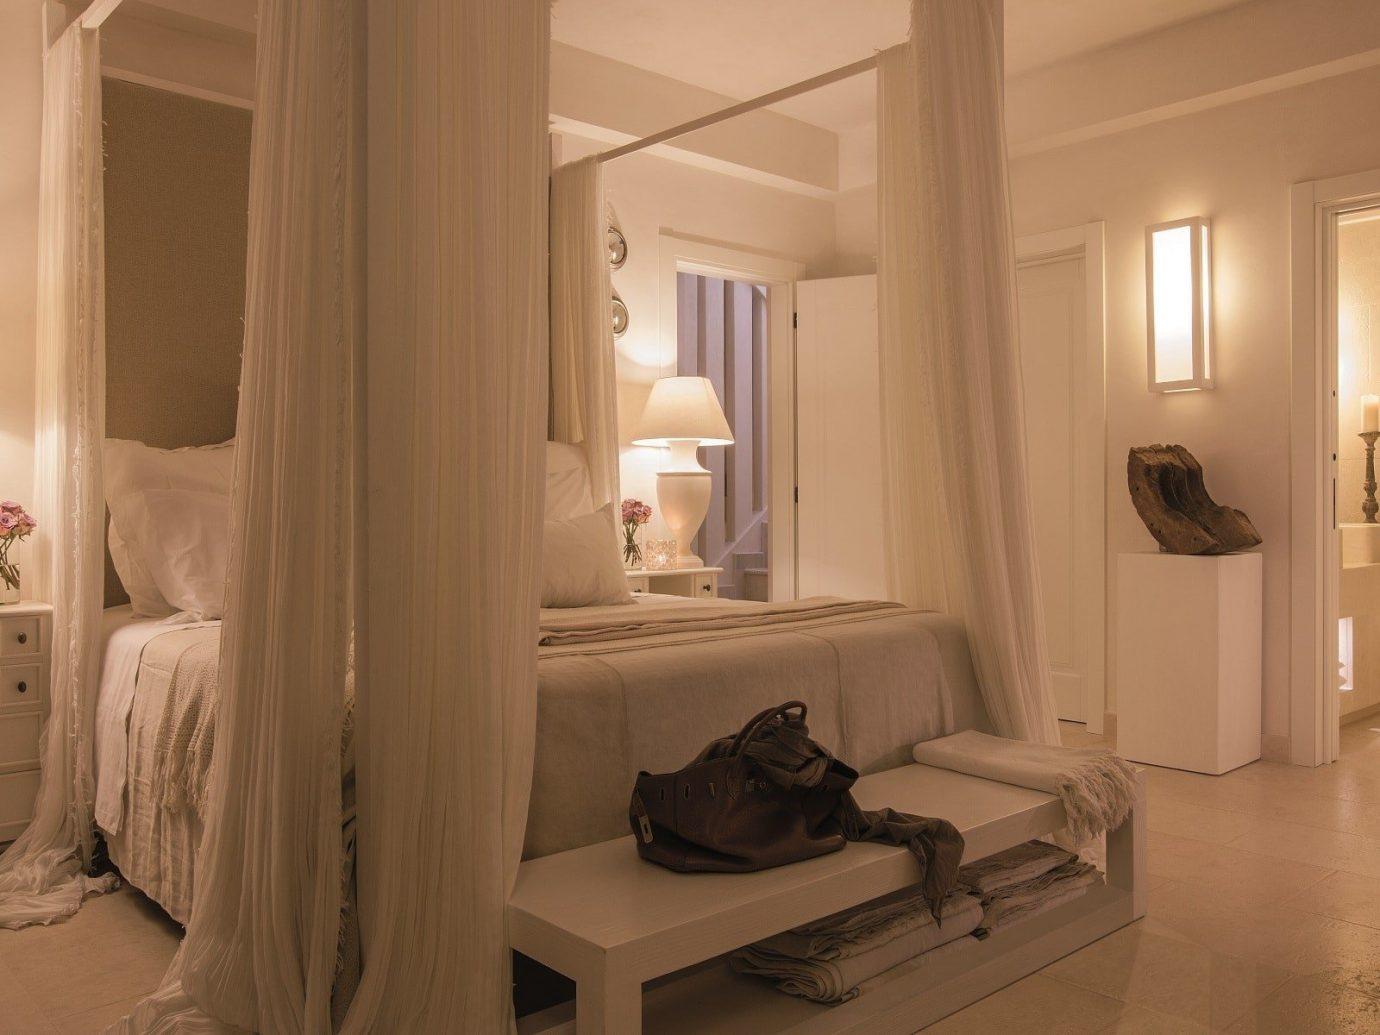 Hotels Luxury Travel wall indoor bathroom room interior design ceiling furniture Suite floor home flooring white interior designer window